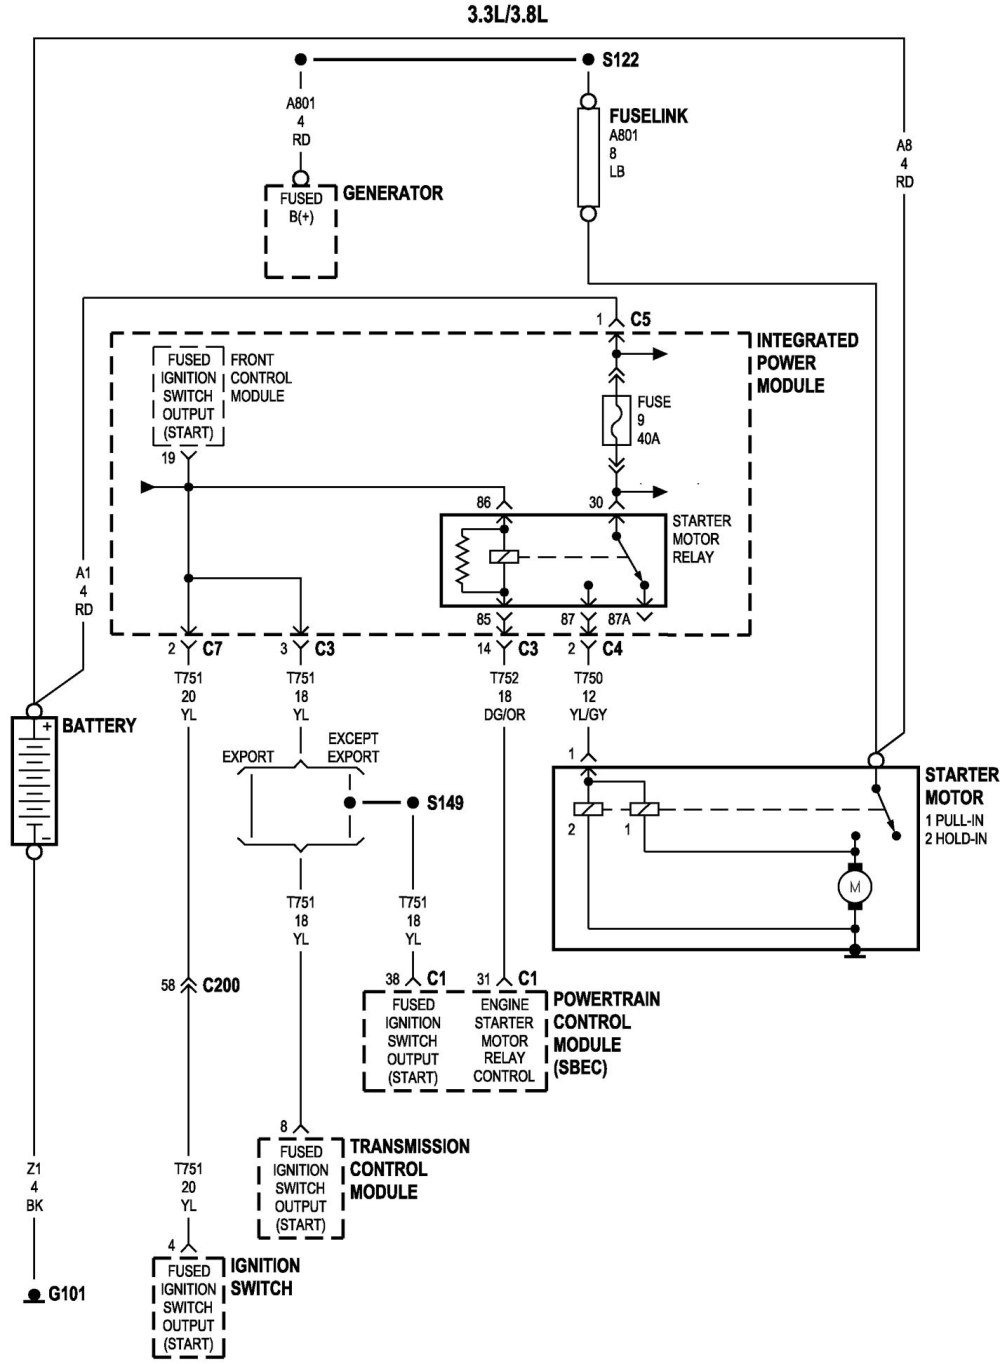 medium resolution of 2006 dodge grand caravan engine diagram dodge durango fuse box ford focus wiring 2006 dodge grand